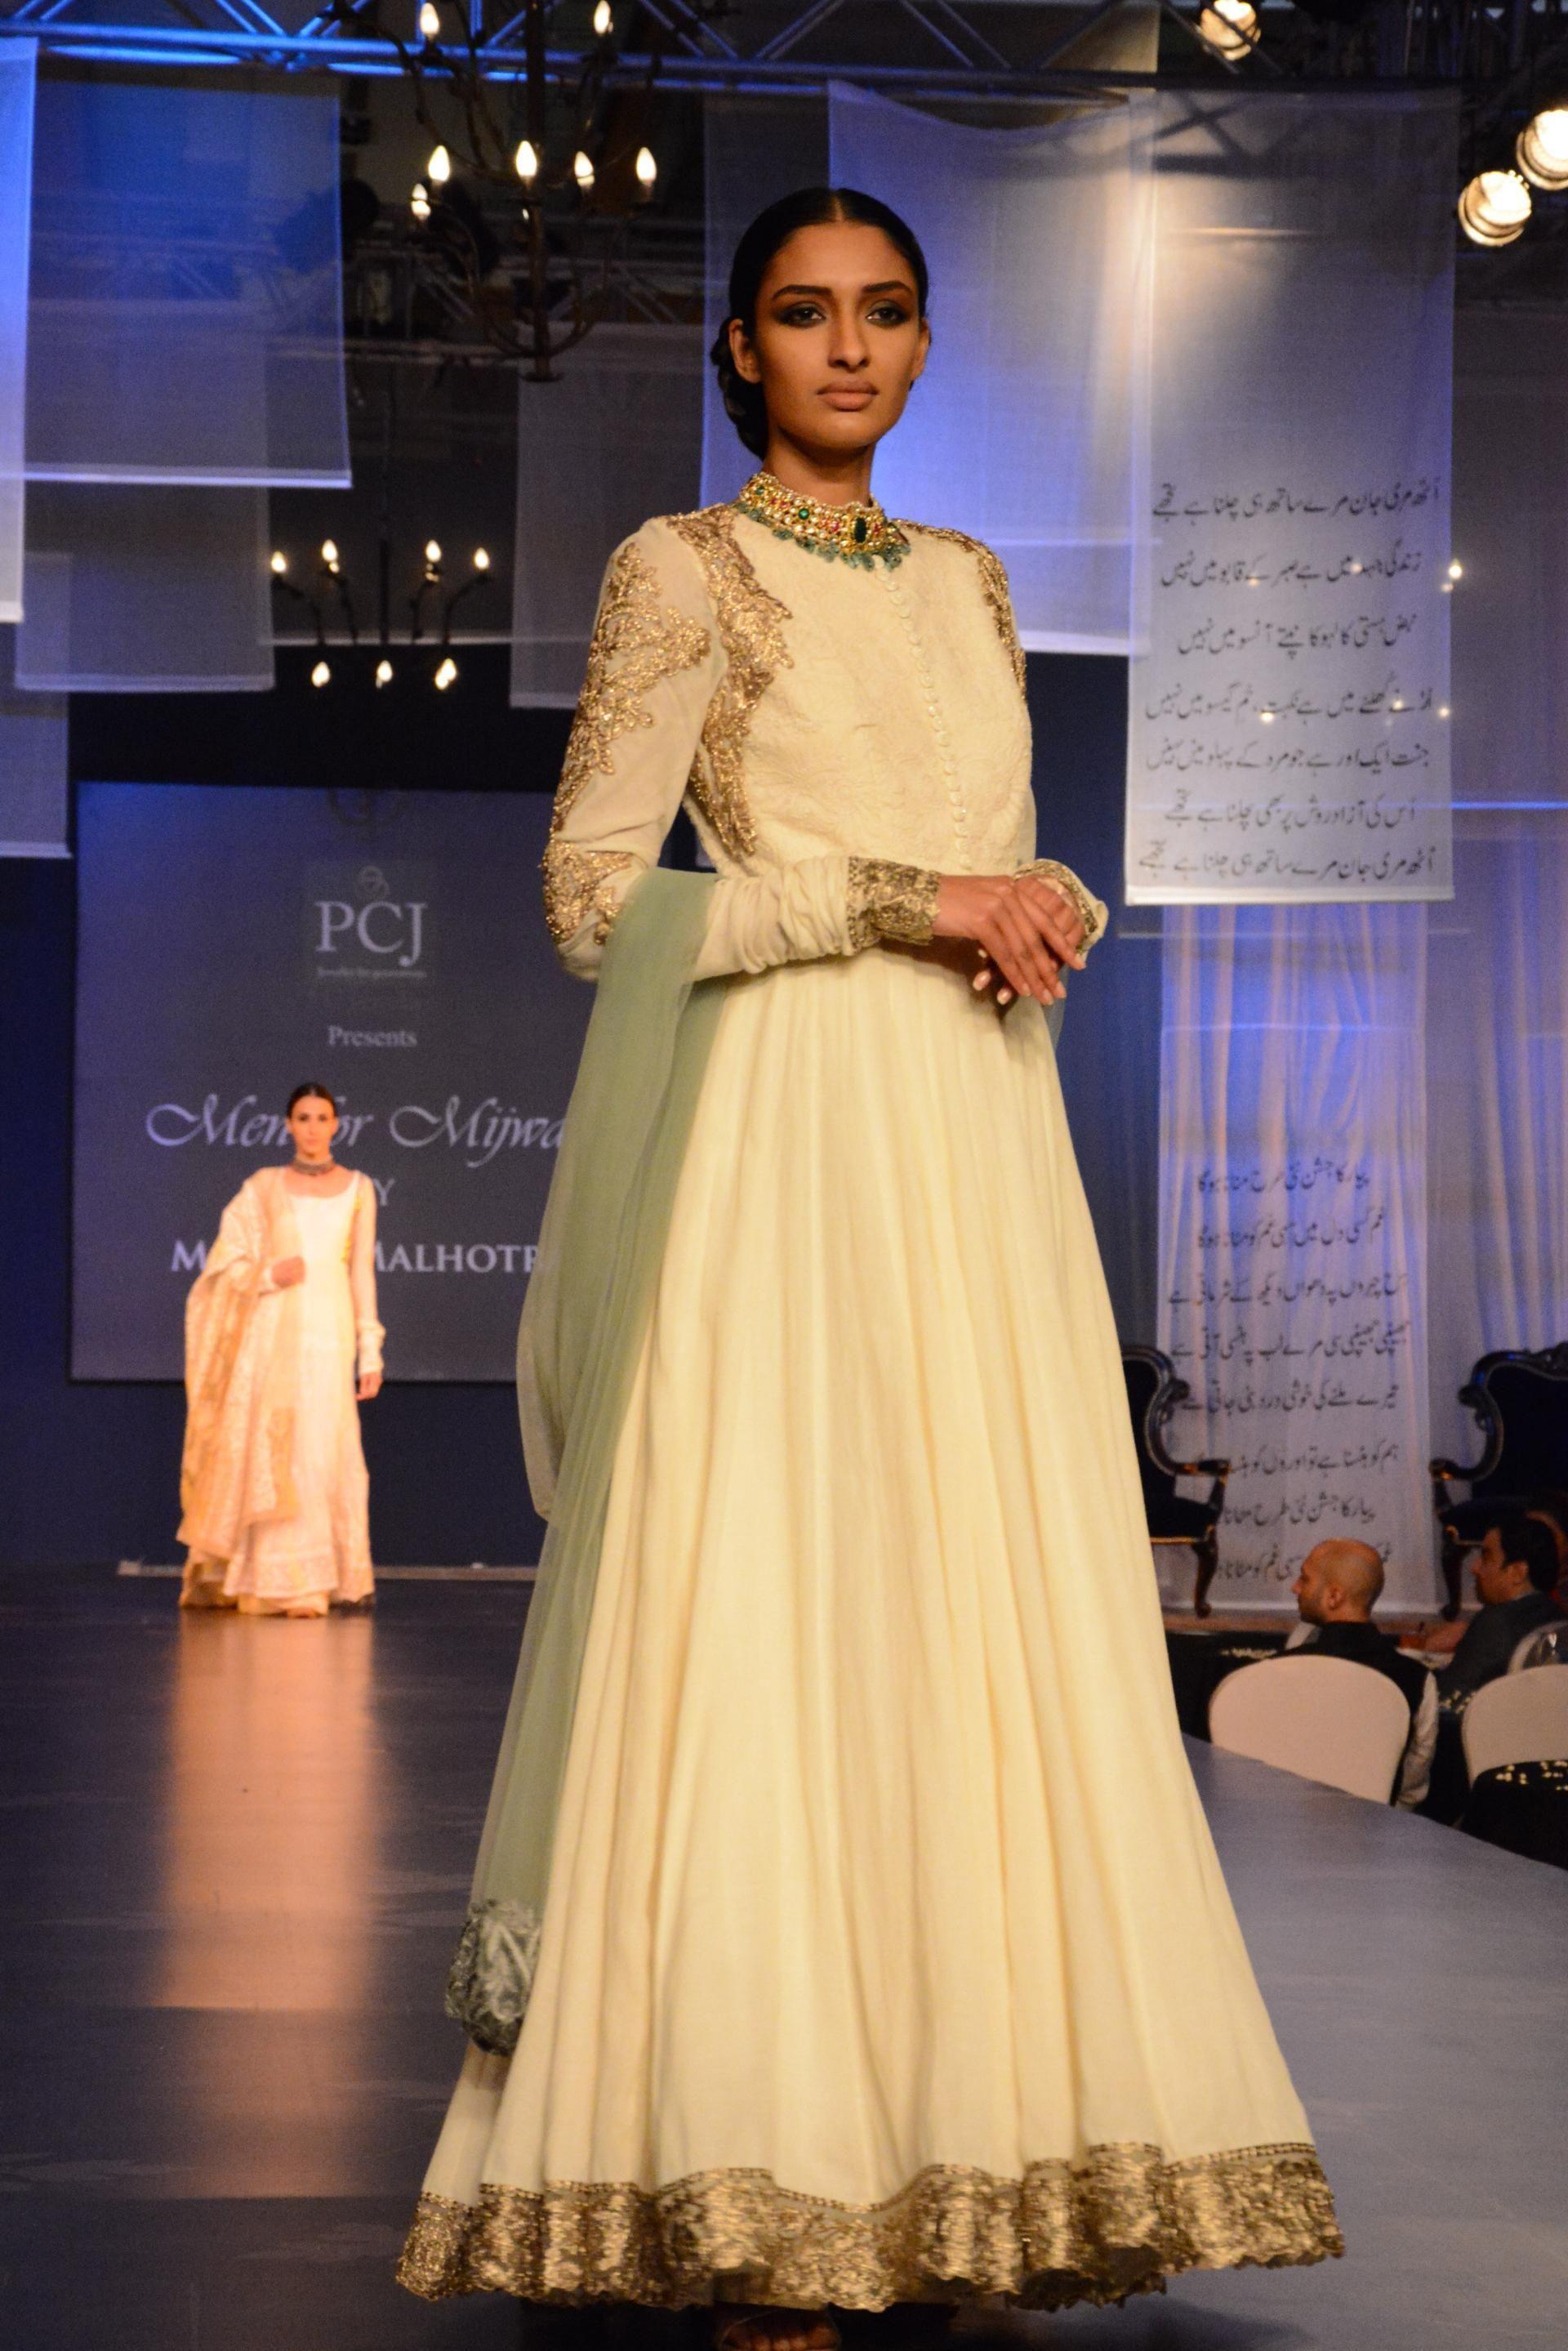 Pin by ambie sandhu on indian fashion pinterest manish mumbai